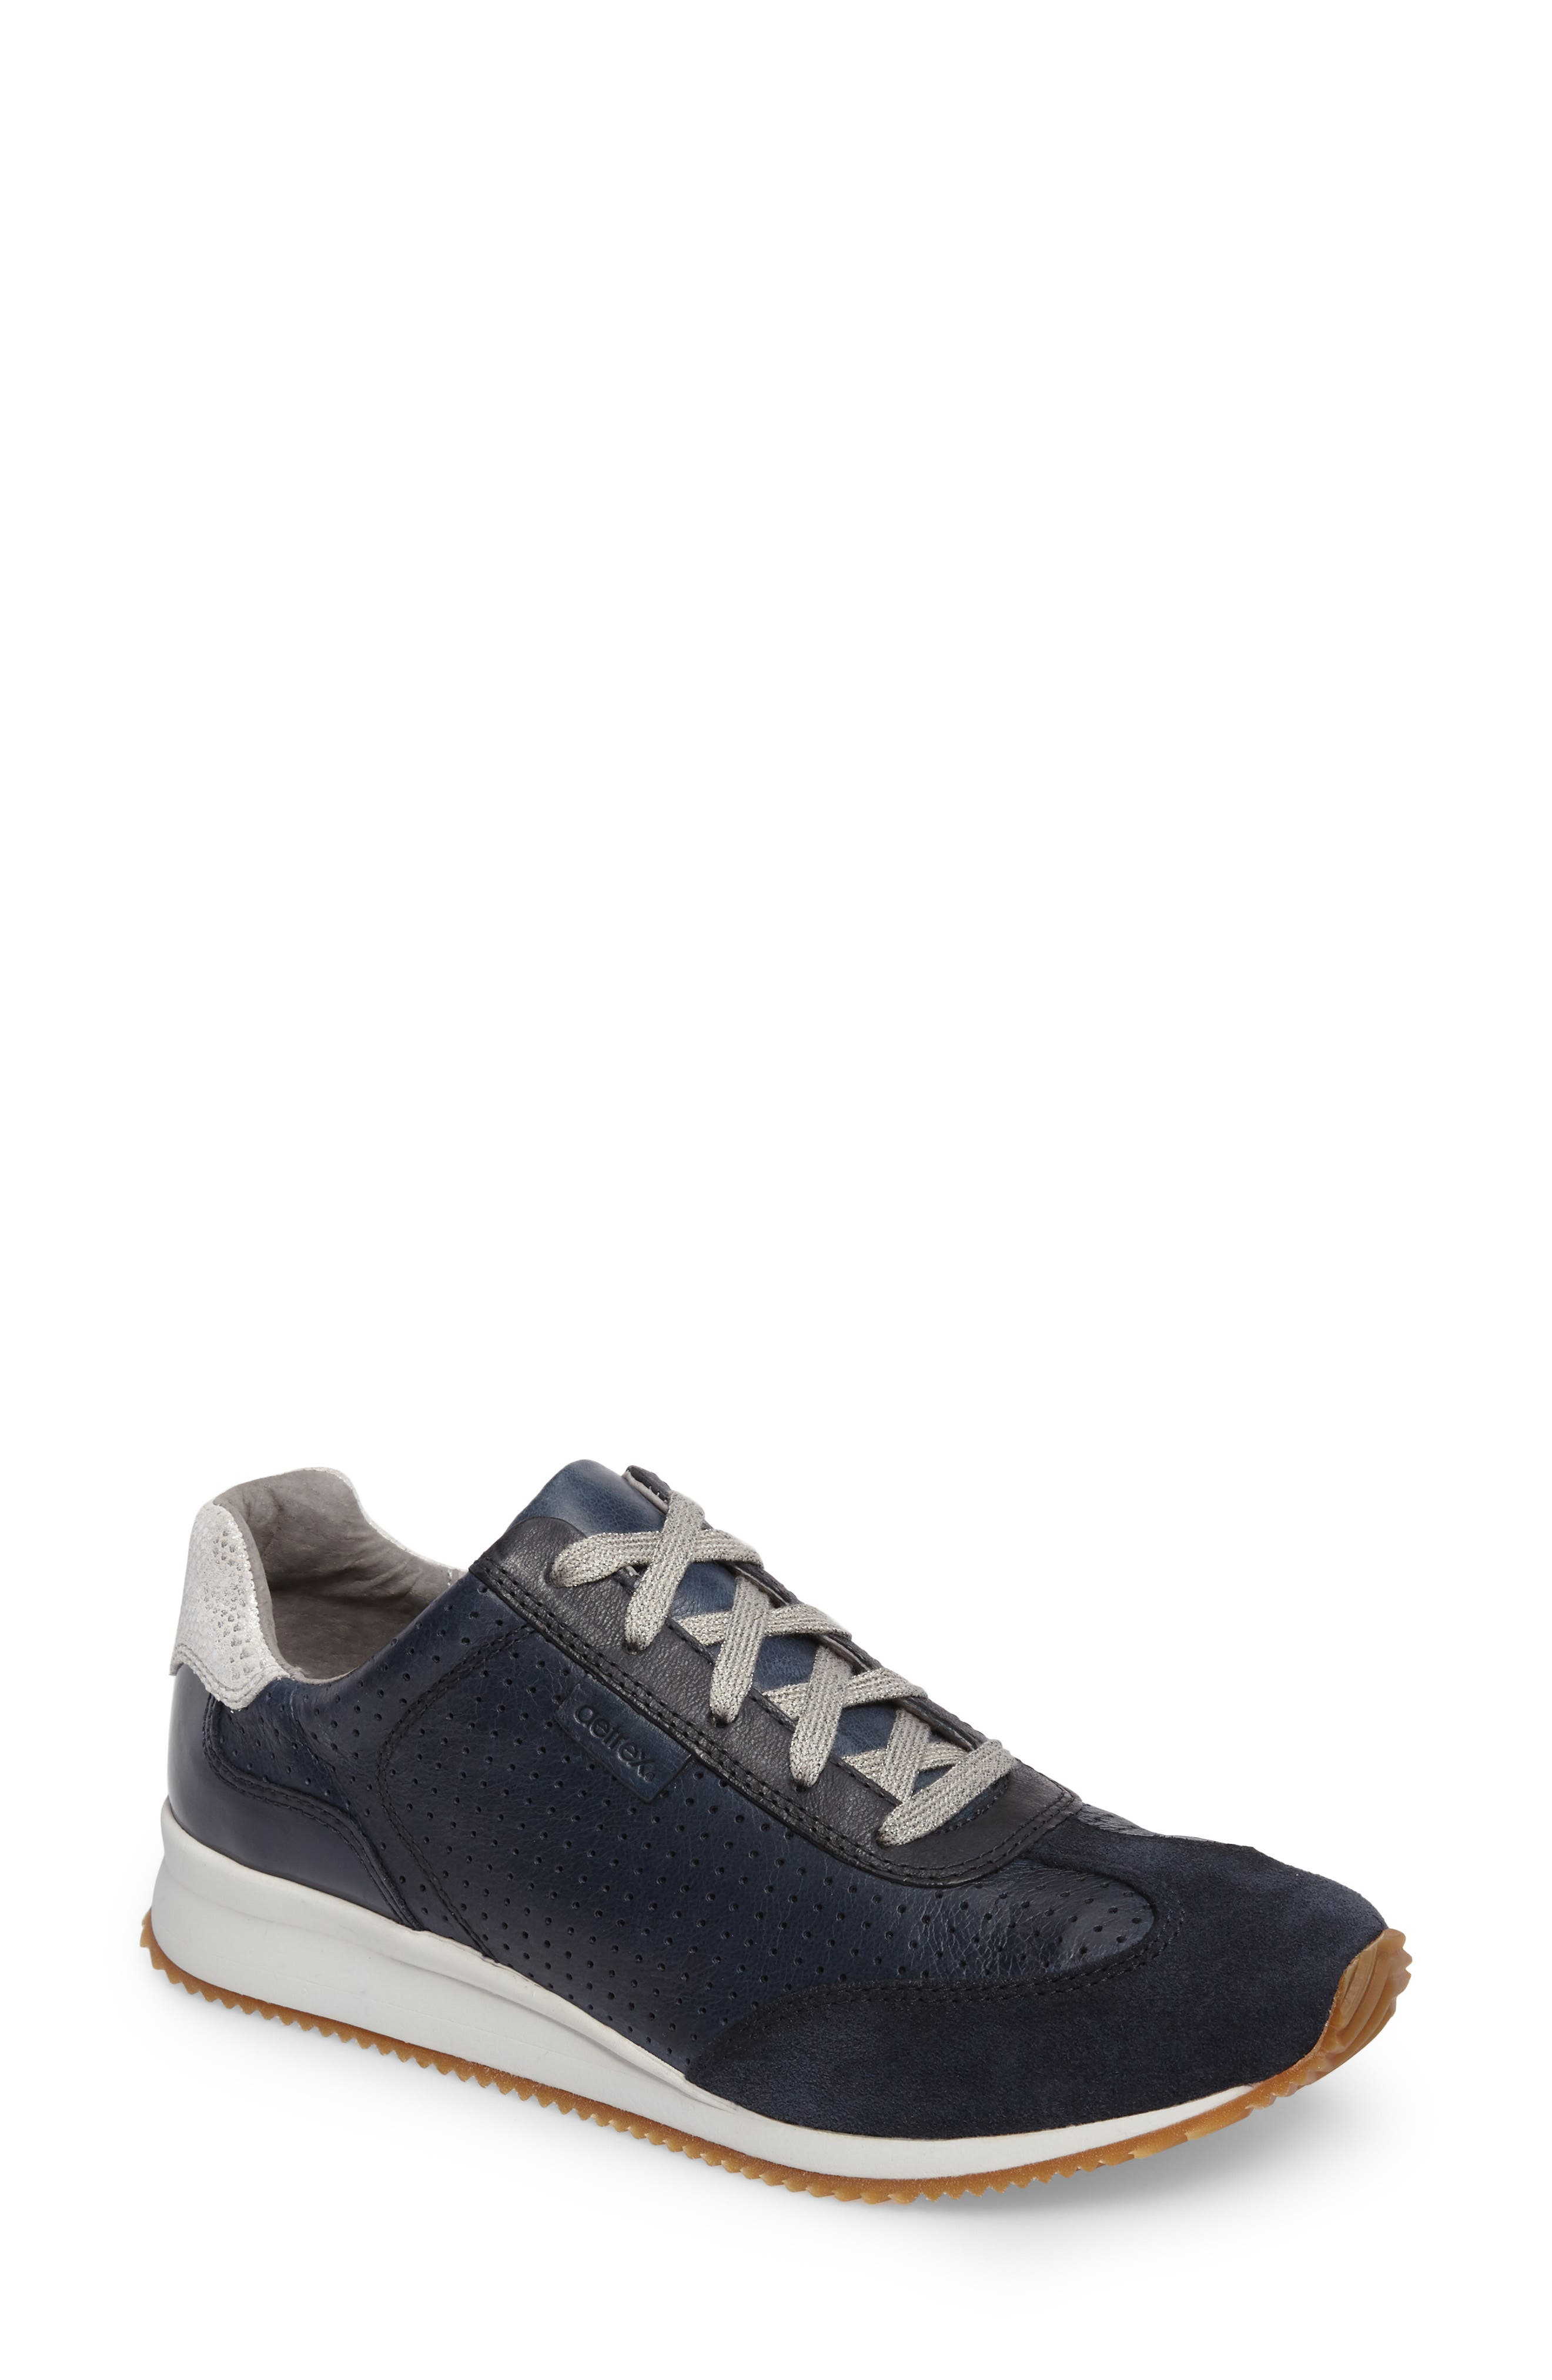 Alternate Image 1 Selected - Aetrex Nadia Sneaker (Women)